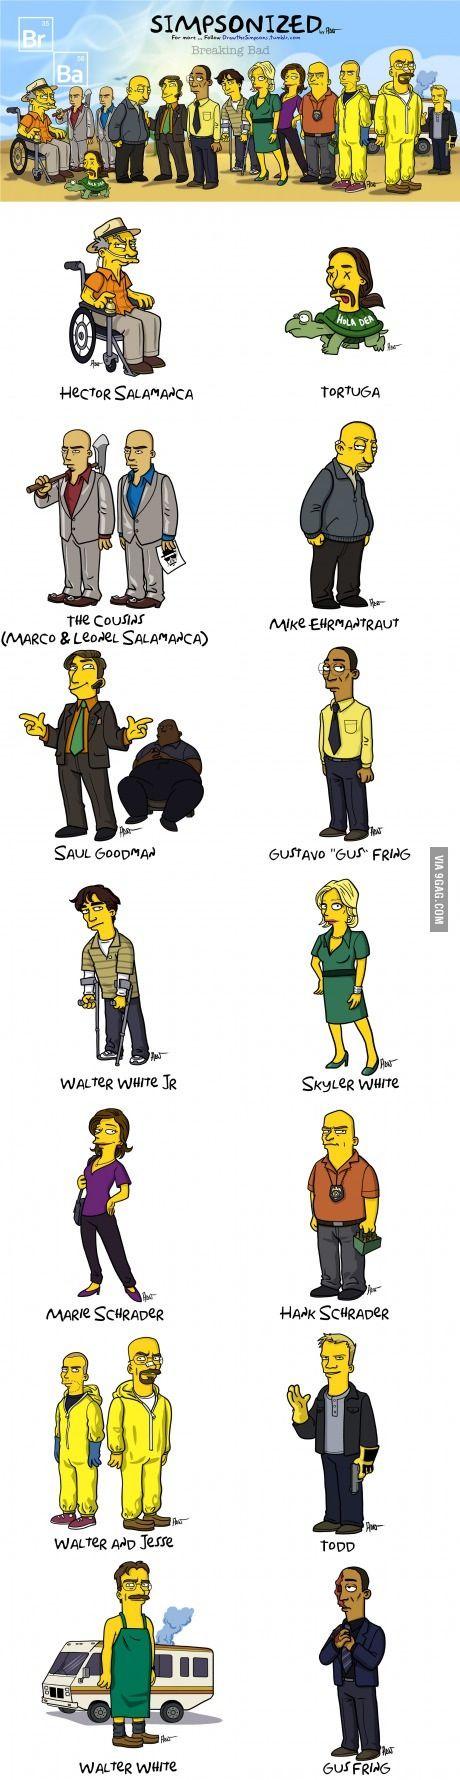 Simpsonized Breaking Bad.